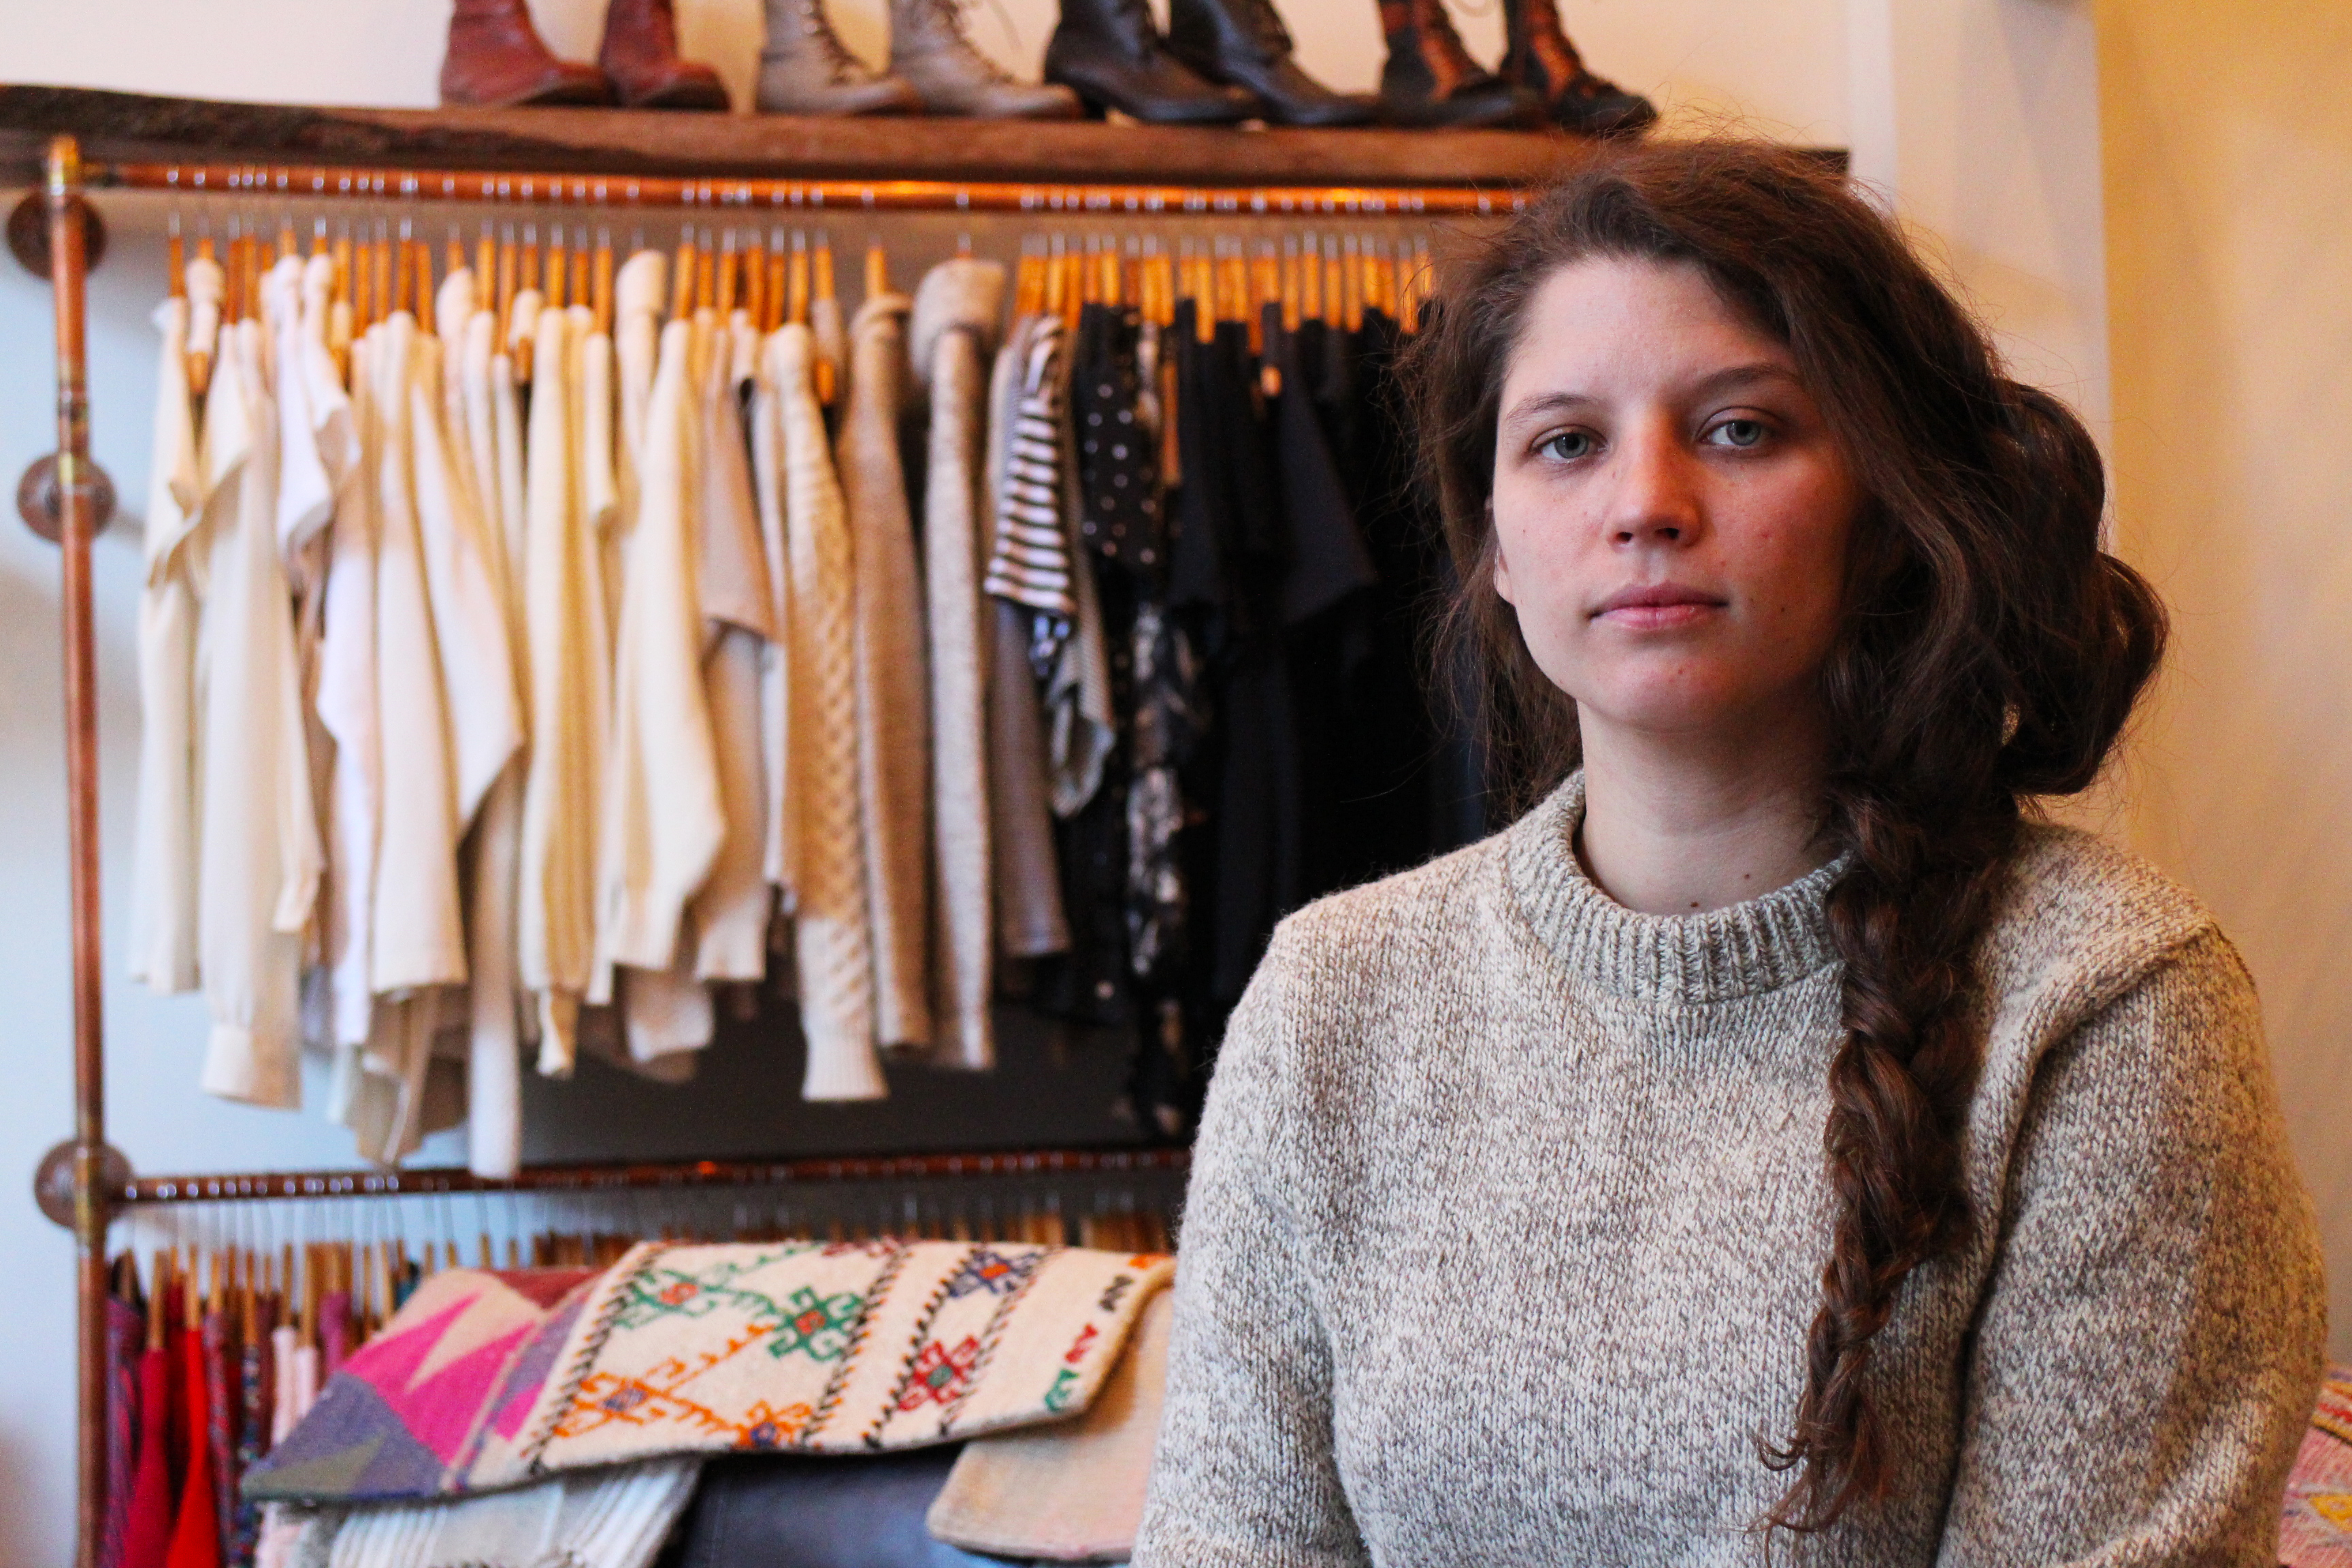 Ashley stewarts clothing store